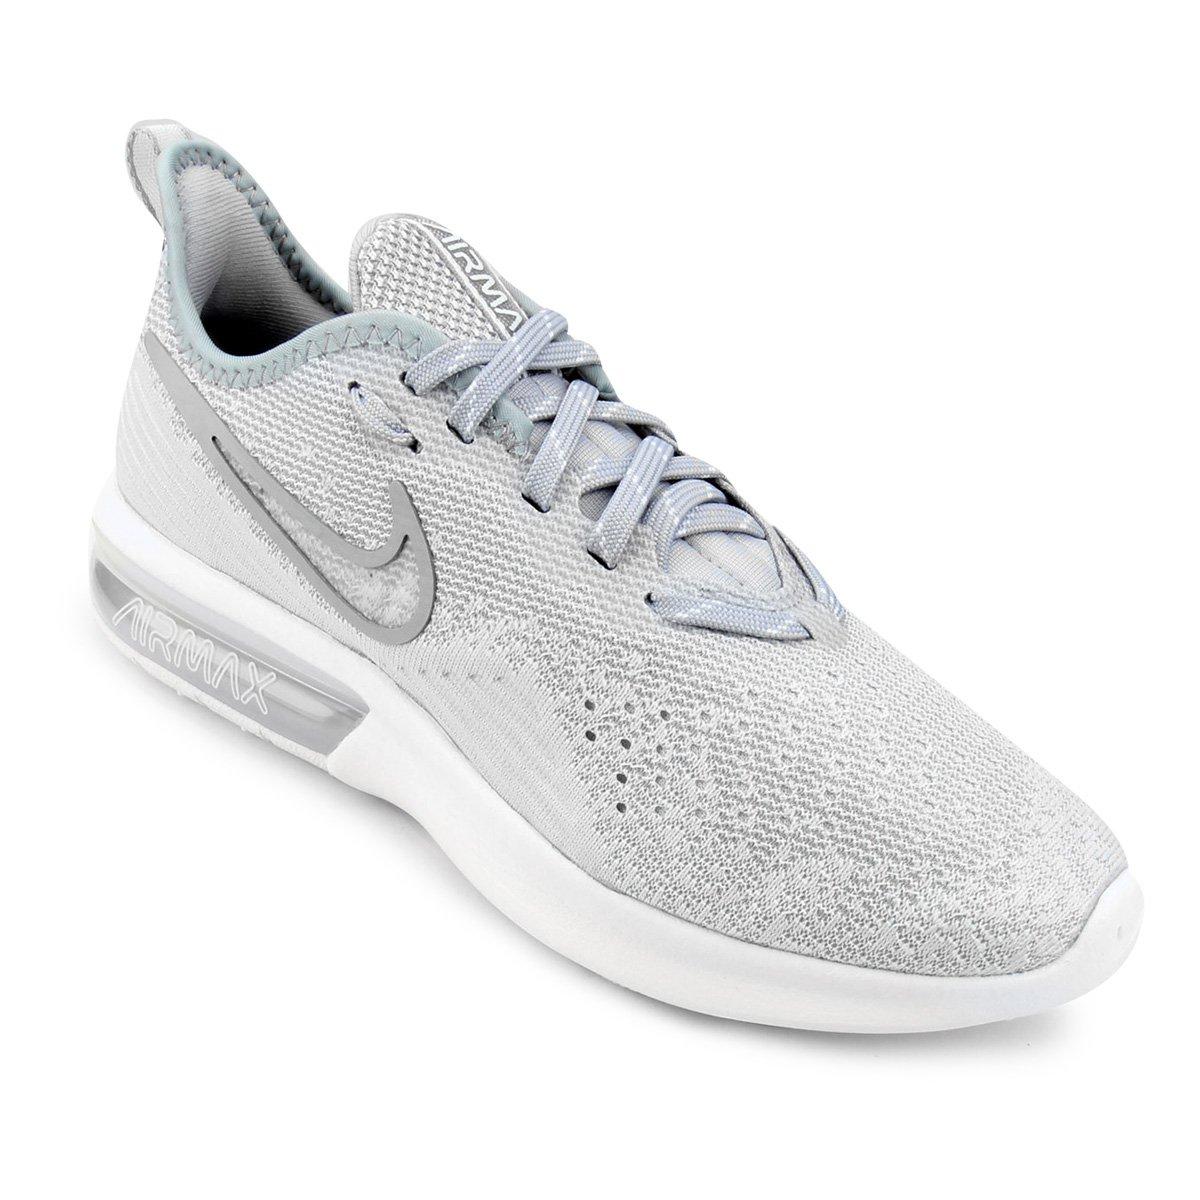 dd8363cff62a9 Tênis Nike Air Max Sequent 4 Feminino - Cinza e Branco - Compre Agora